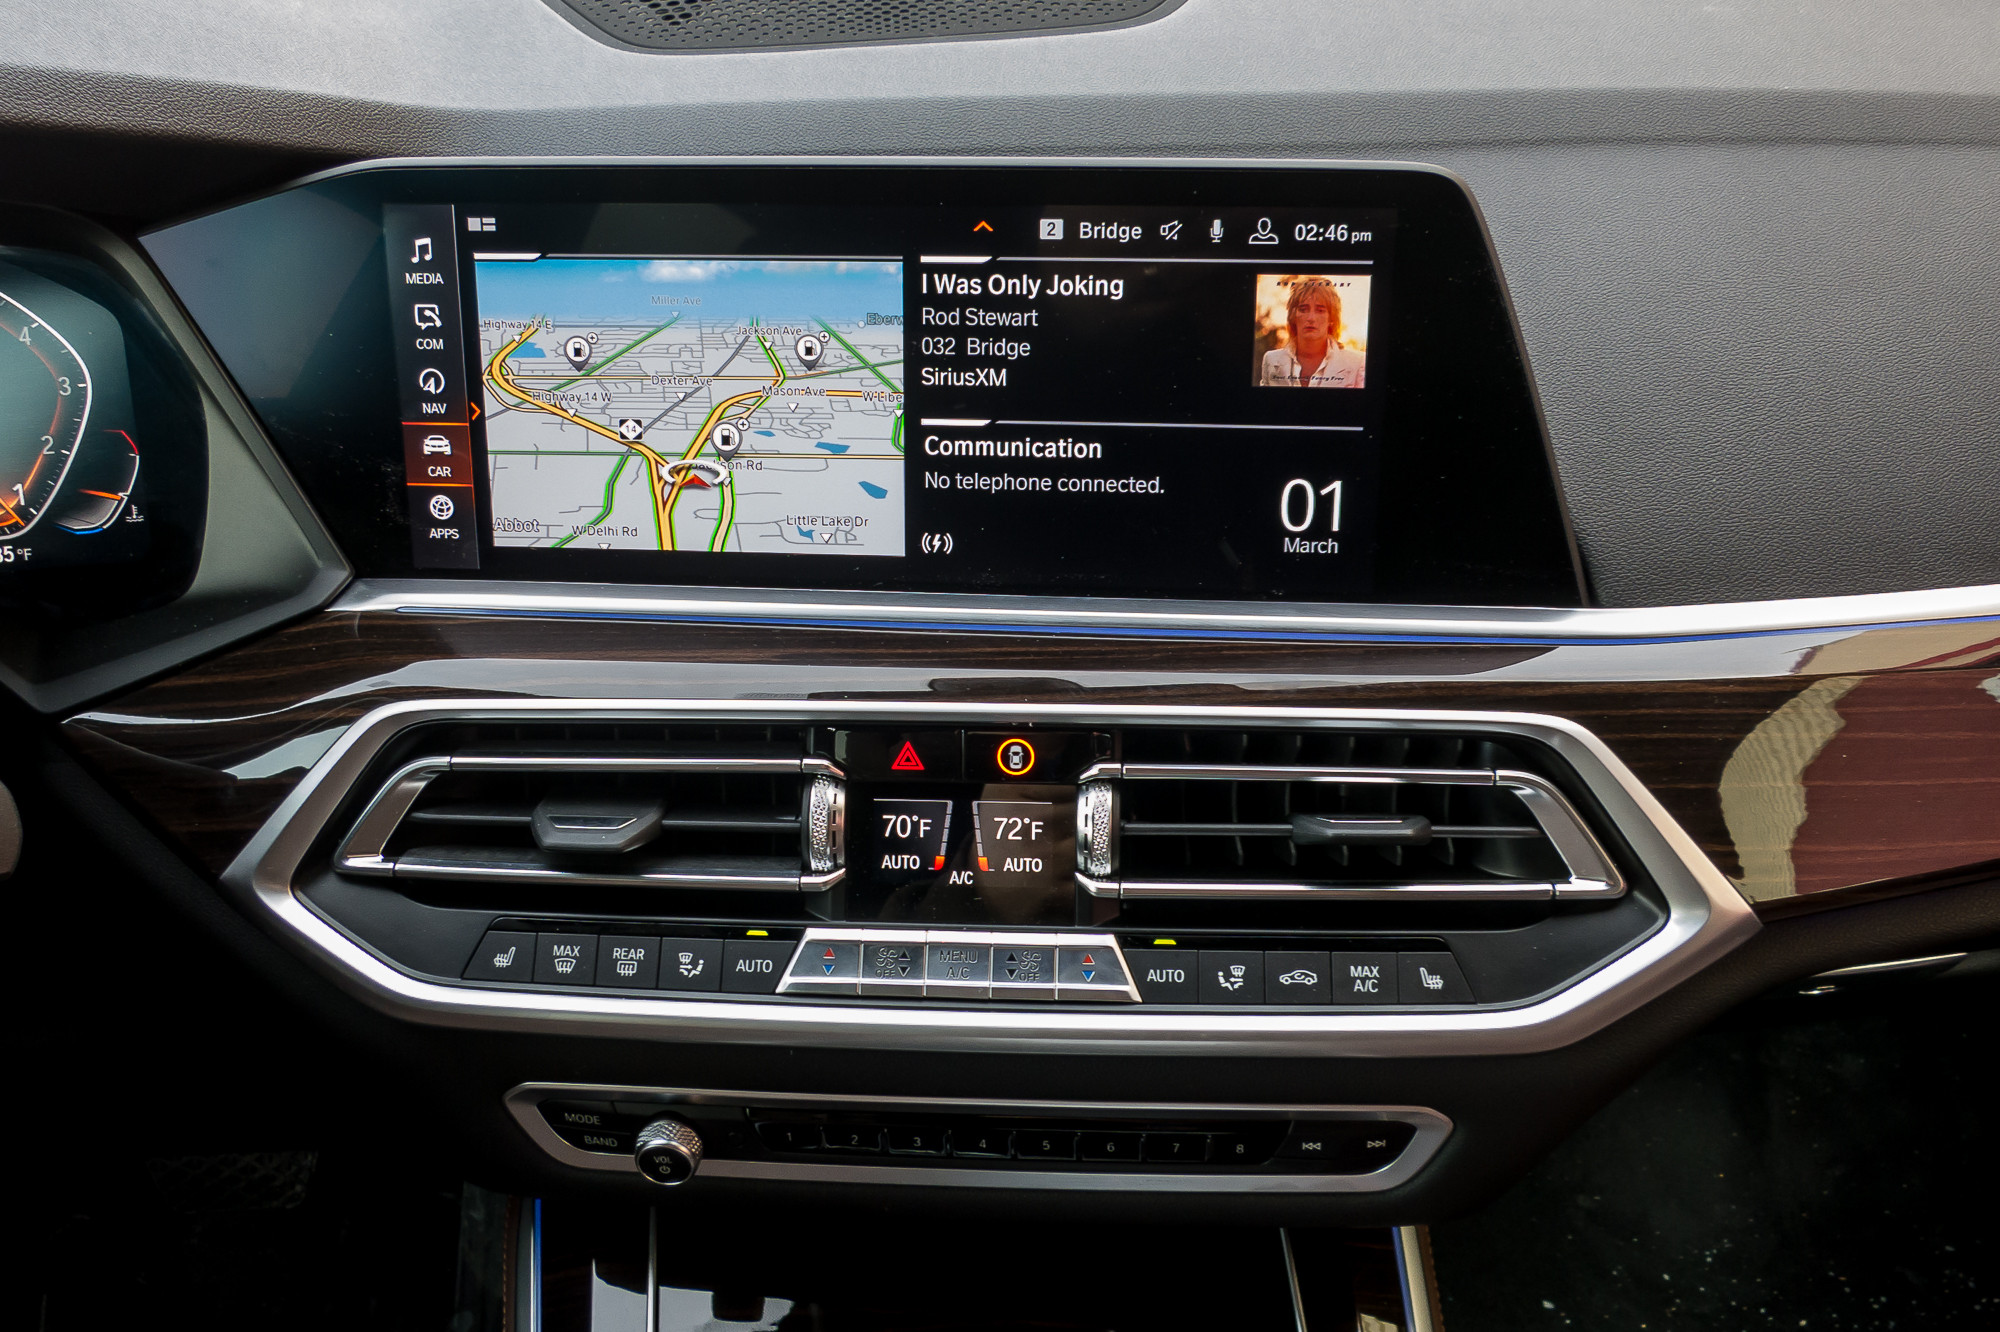 2019 BMW X5 Review: Excellent SUV, Iffy BMW | News | Cars com